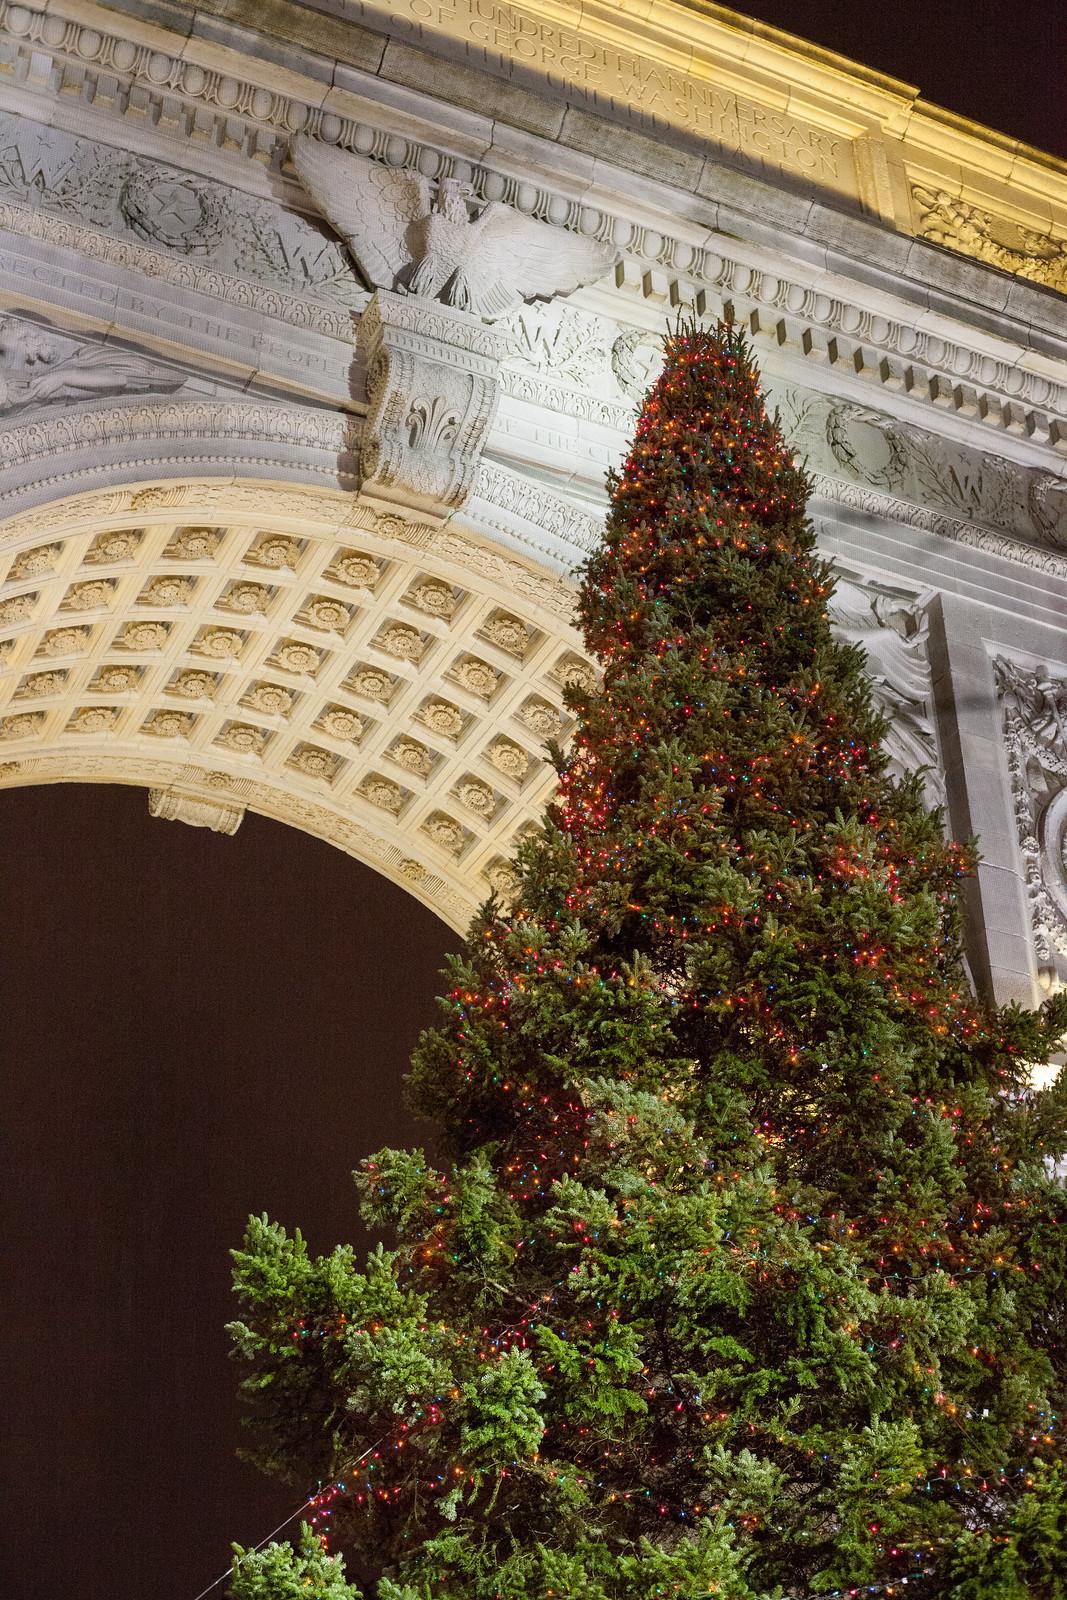 Christmas Tree at the Washington Arch by wwward0